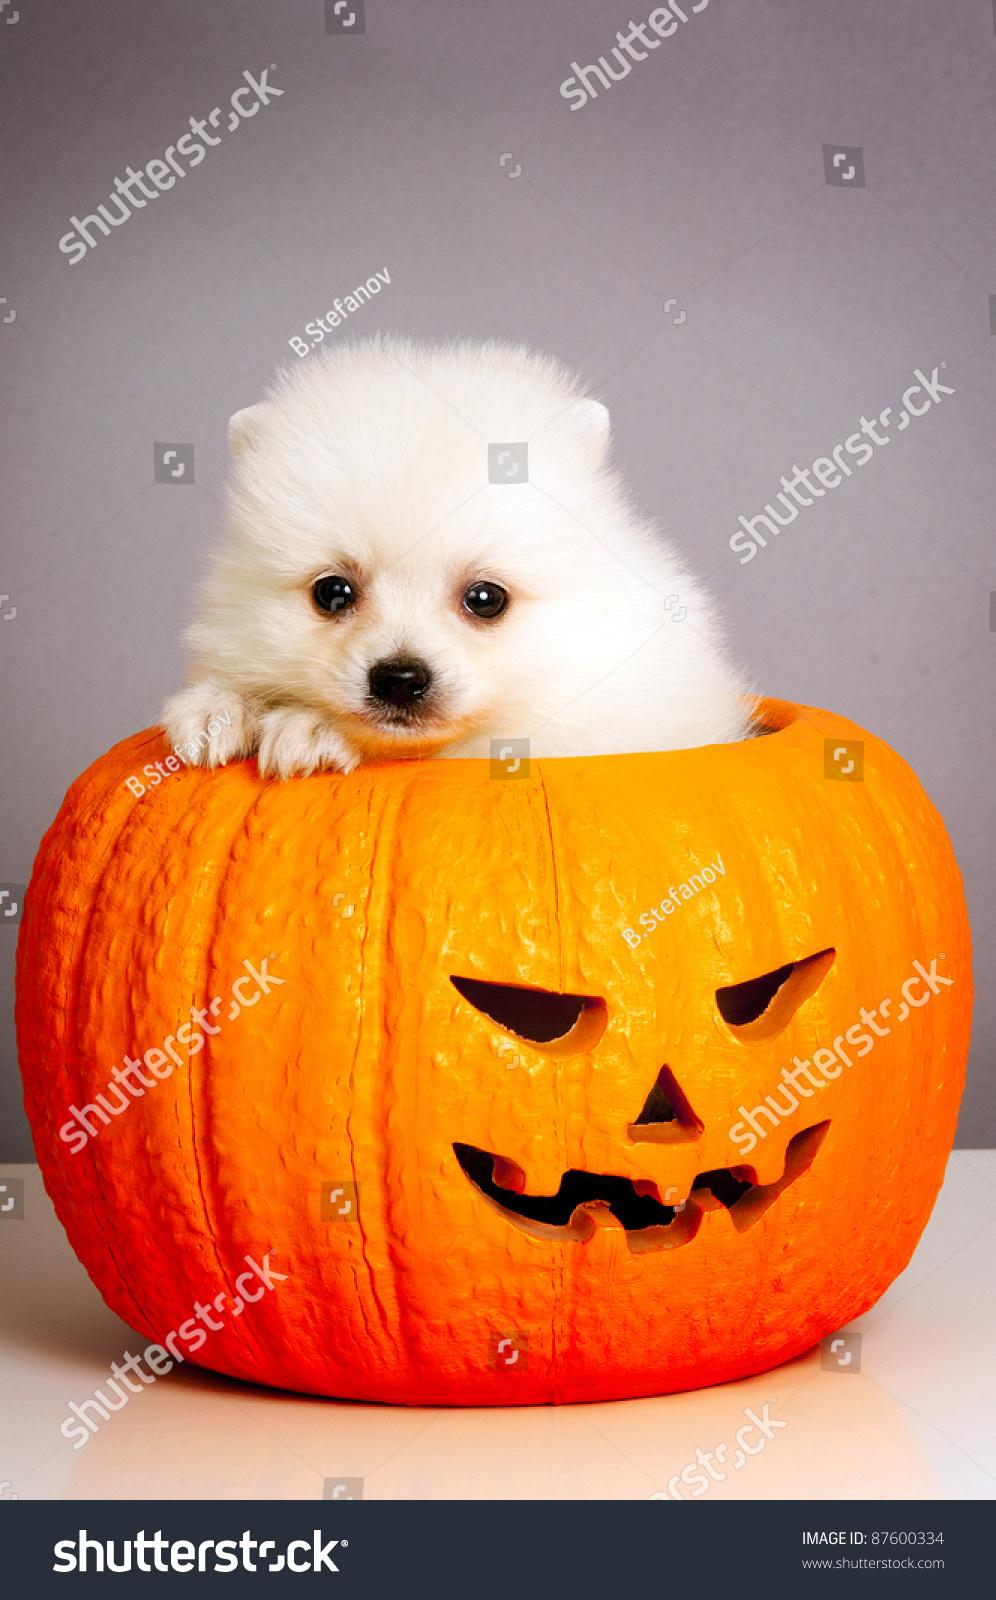 jack o lantern pumpkin puppy pomeranian stock photo (edit now